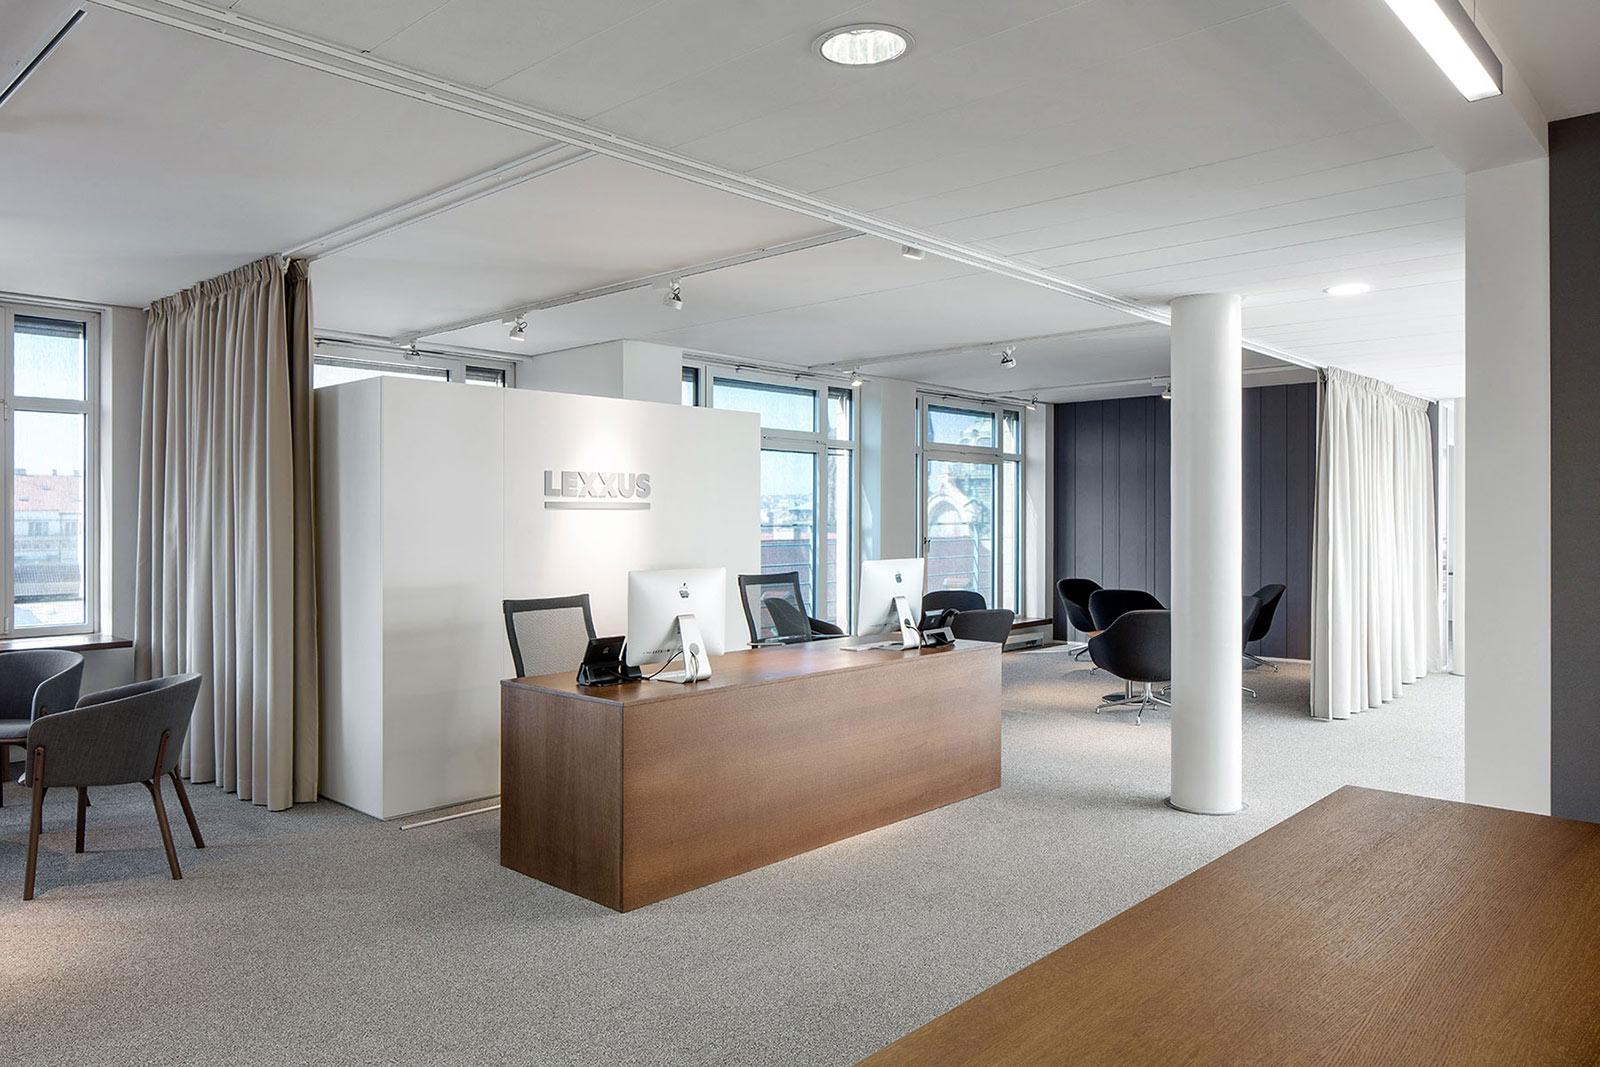 Klientská zóna Lexxus